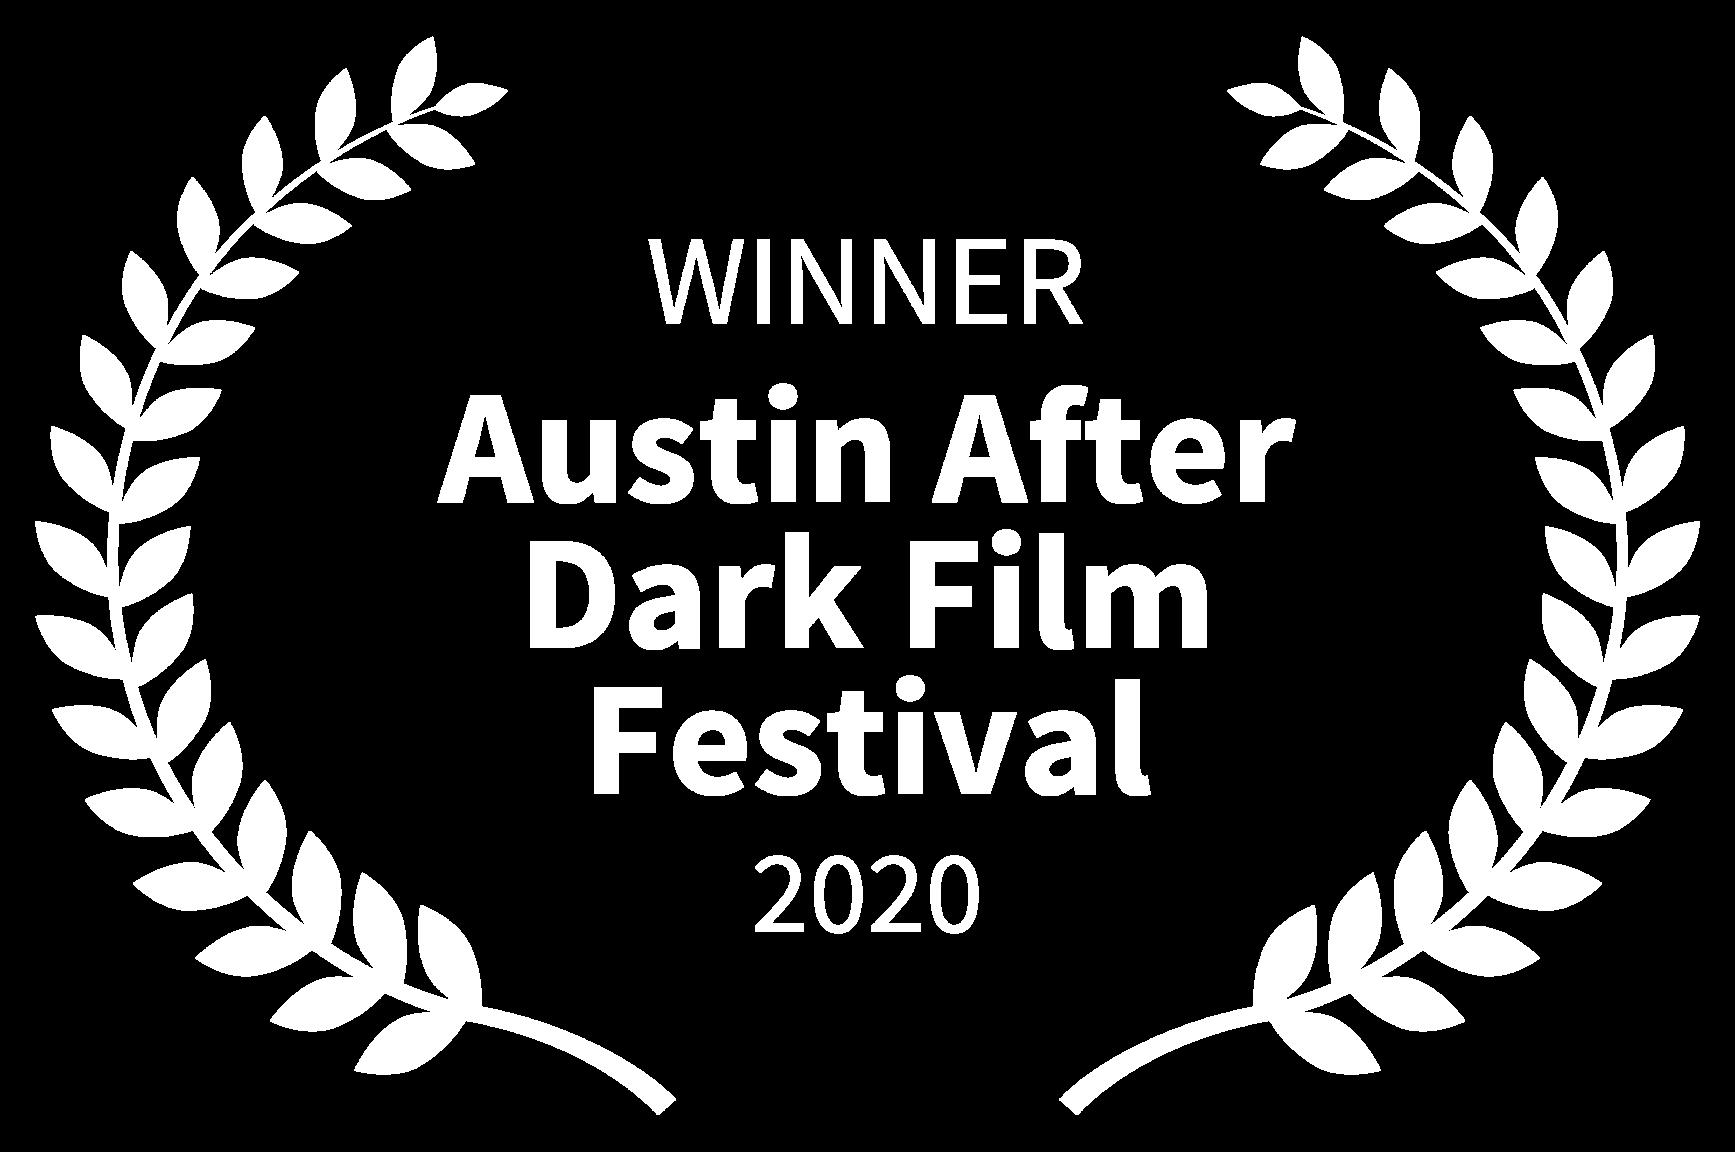 WINNER - Austin After Dark Film Festival - 2020